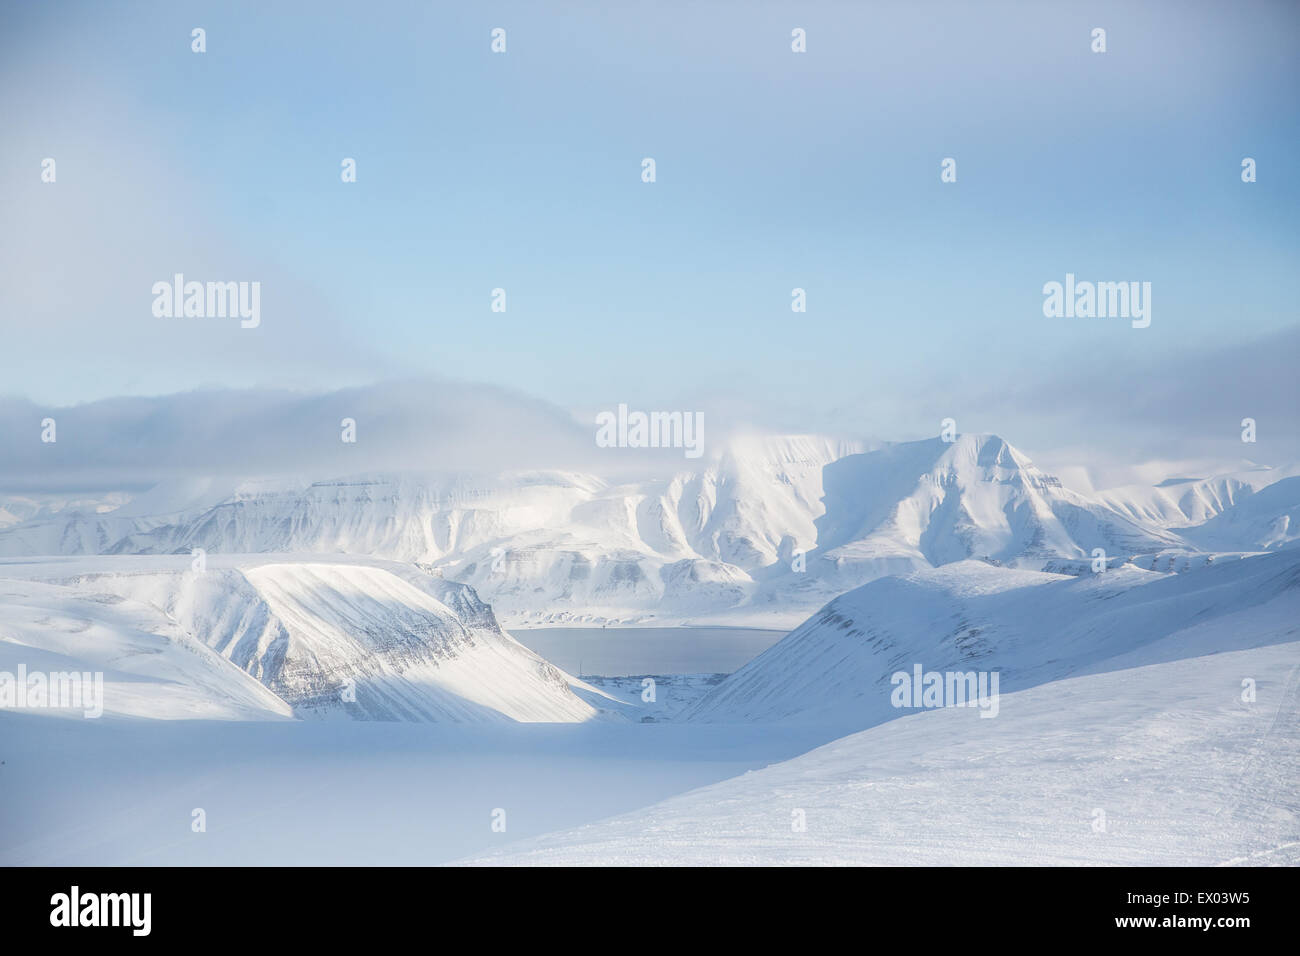 Snowy mountain landscape, Svalbard, Norway - Stock Image